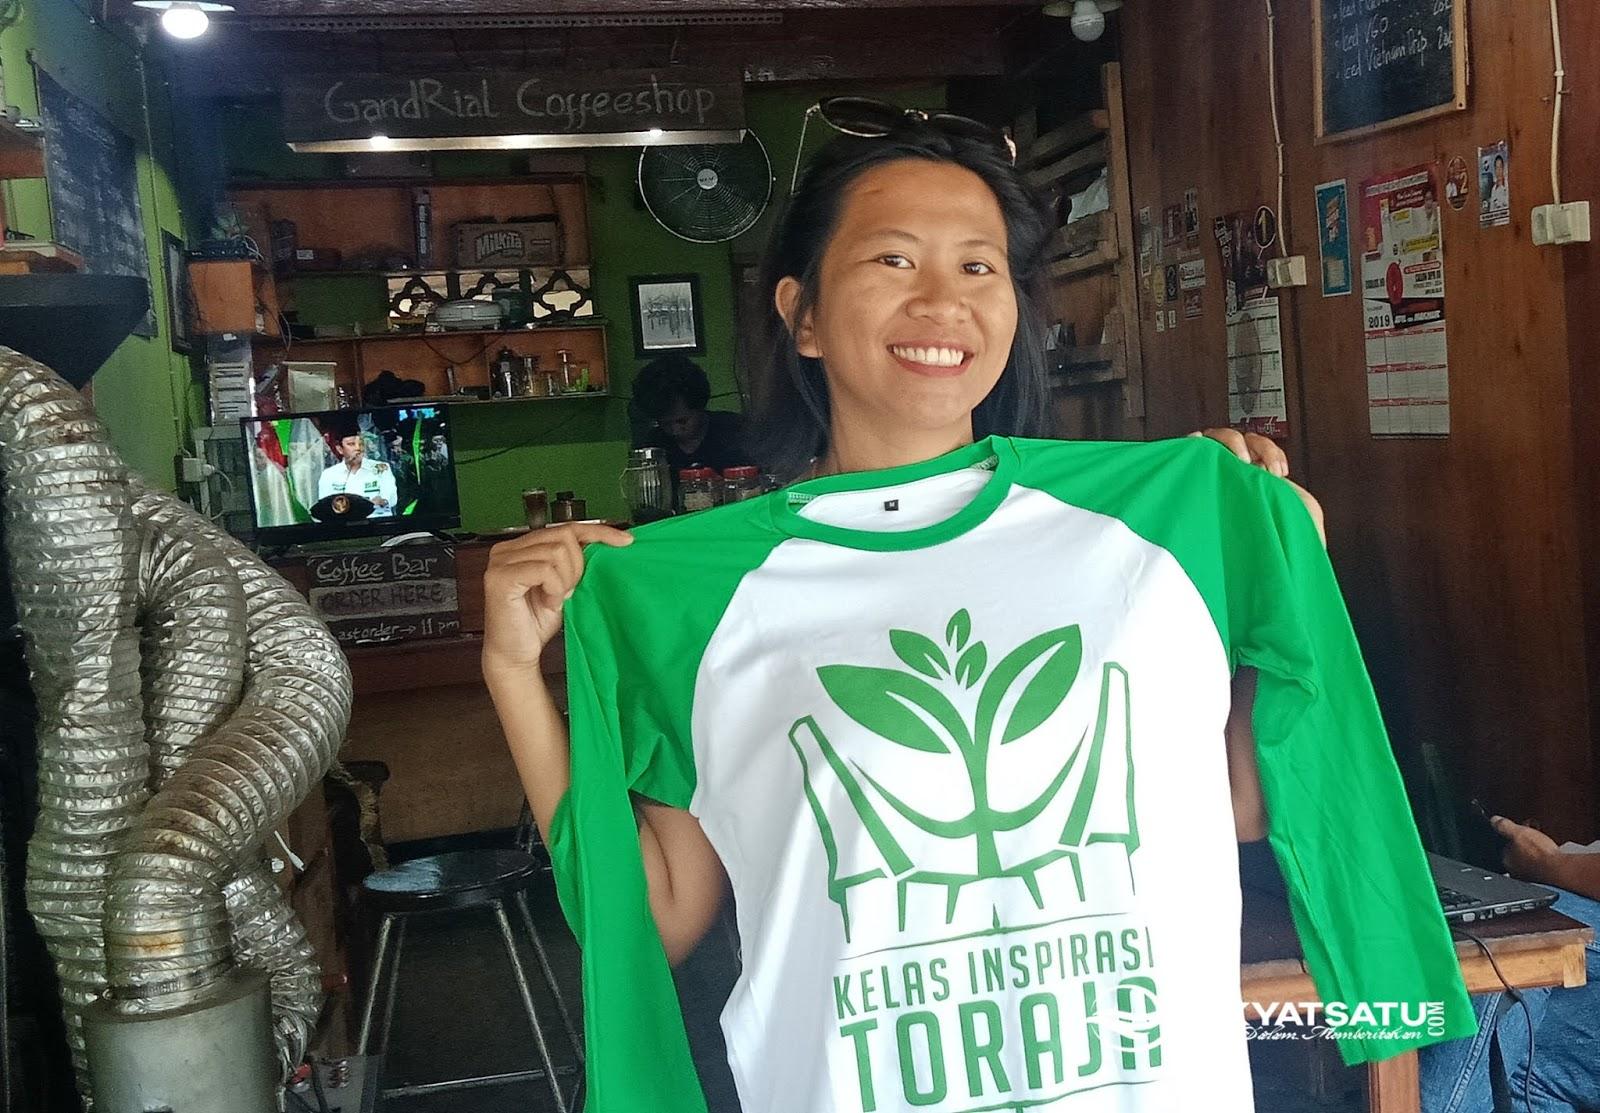 Yuk, Donasi Kelas Inspirasi Tana Toraja Lewat Kaos Keren untuk Zona Inspirasi Masanda